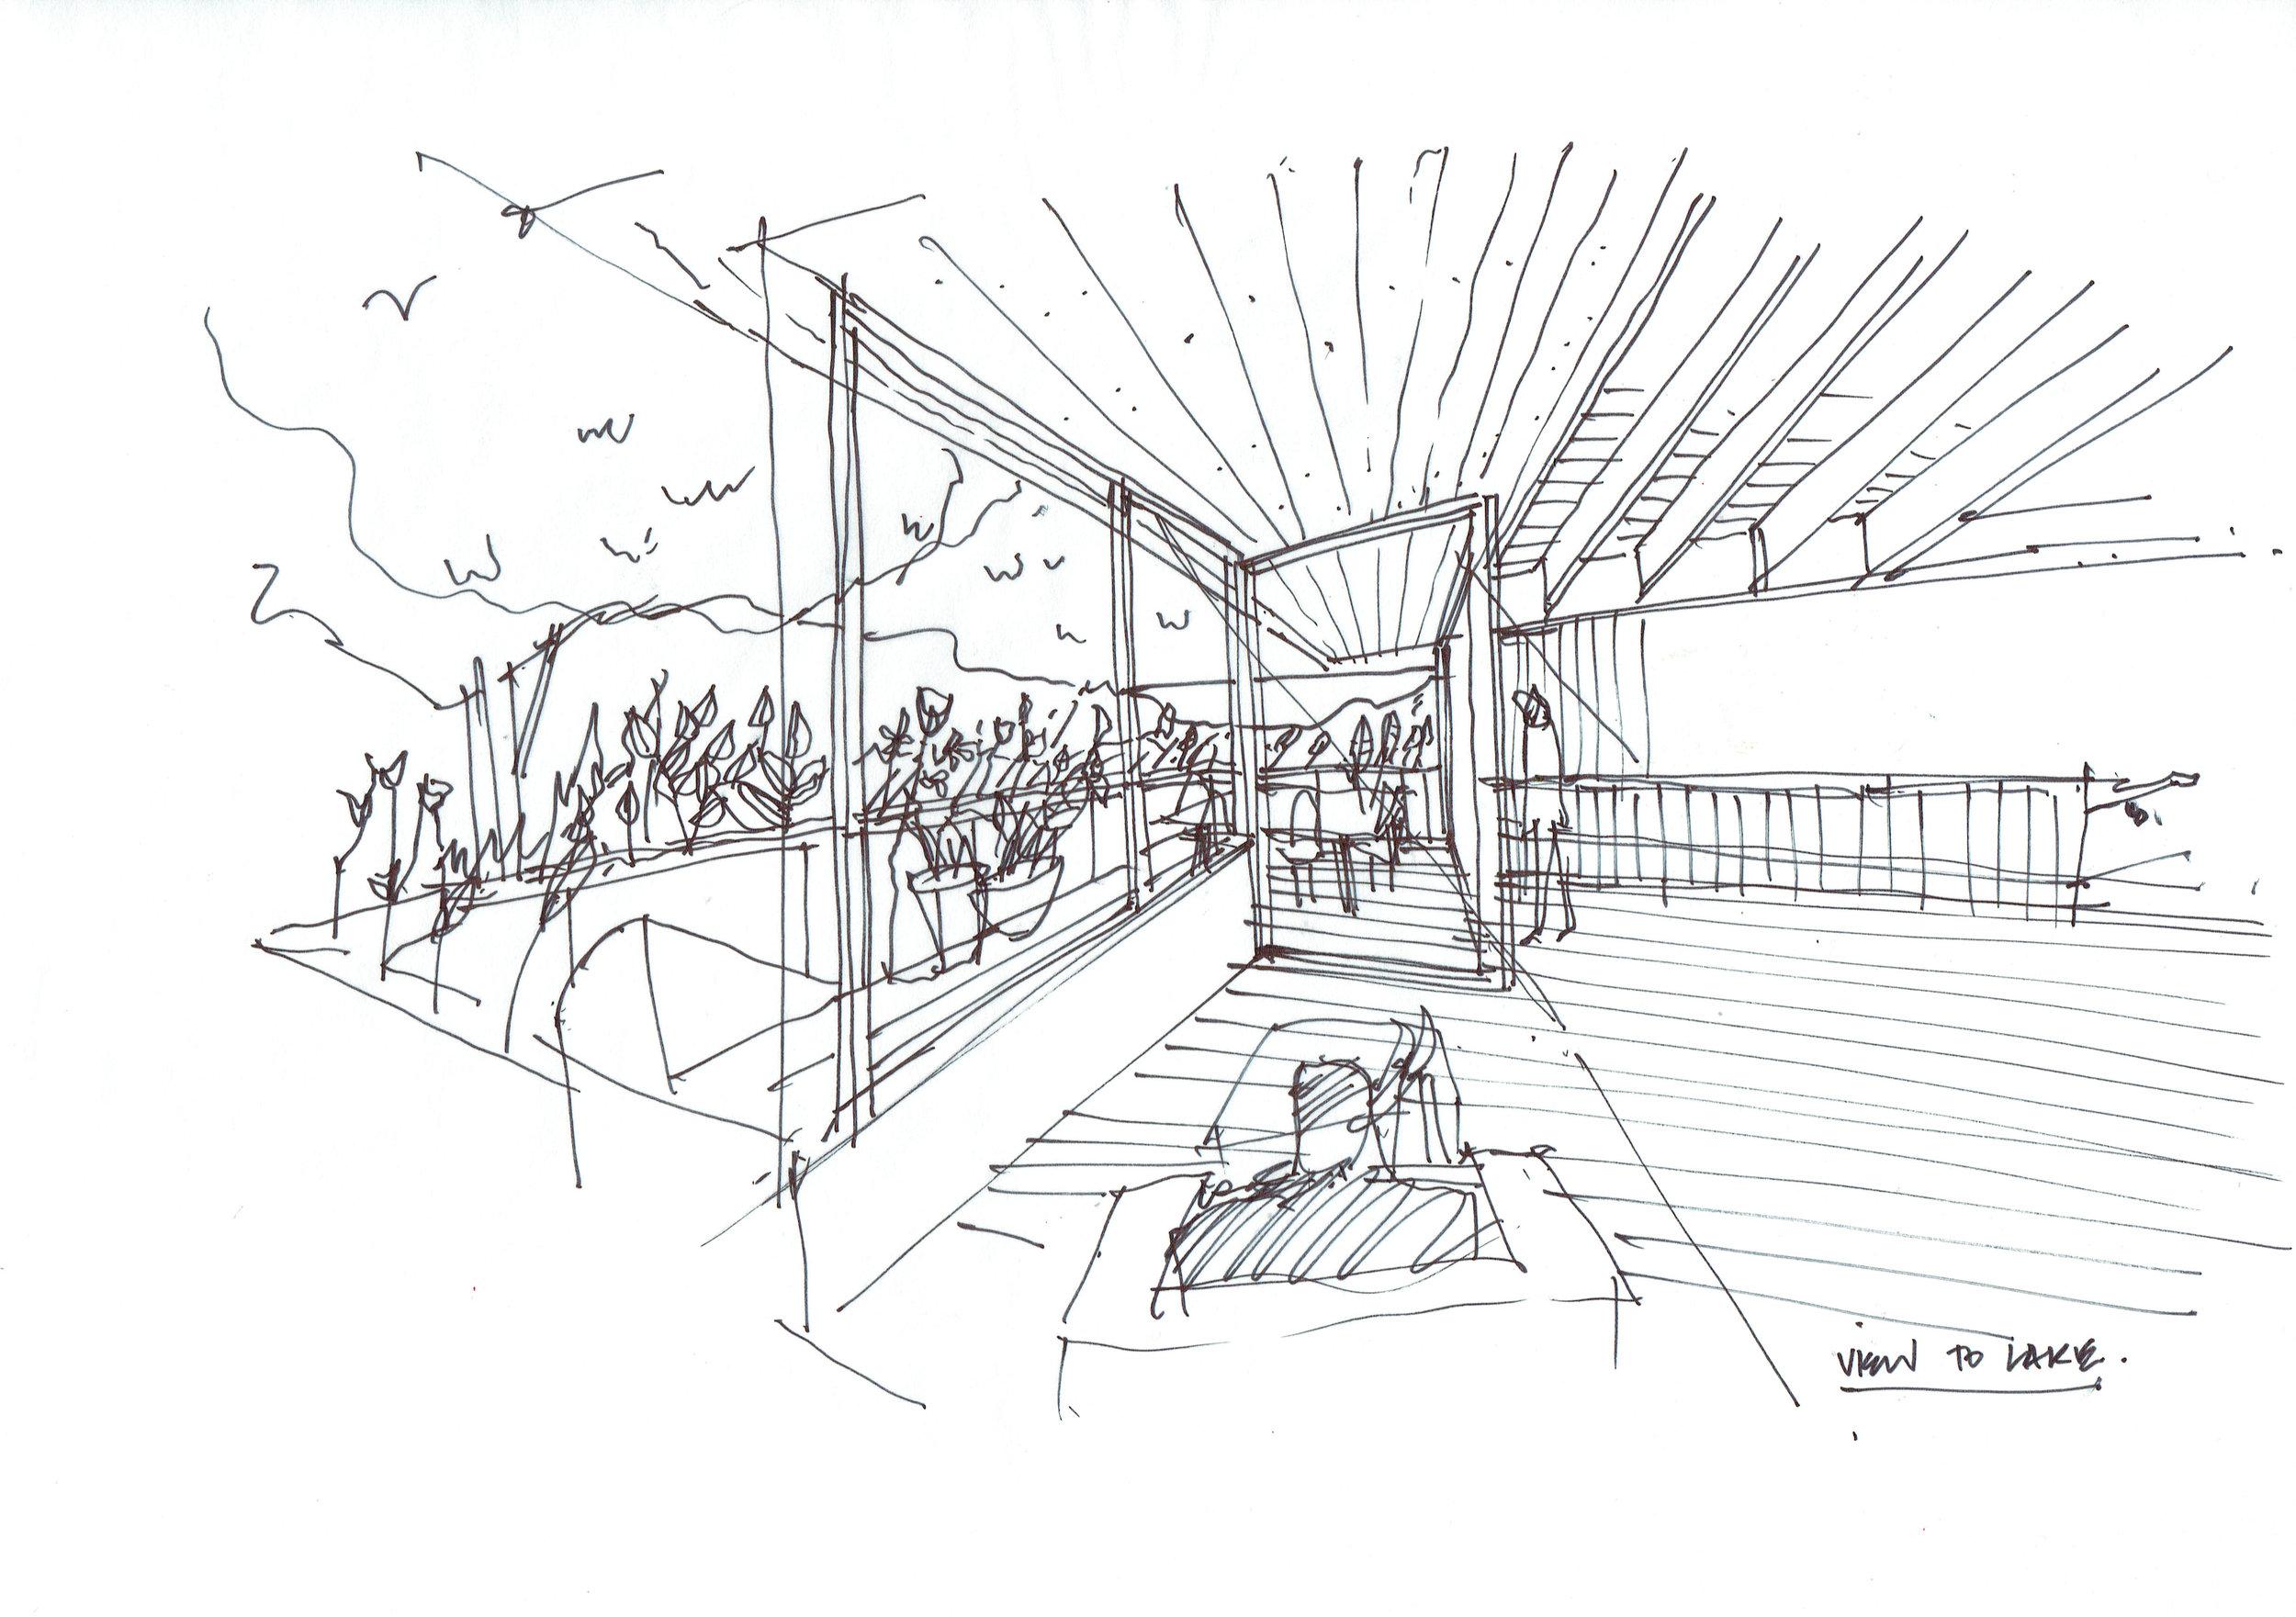 180503_Interior Sketch 3.jpg